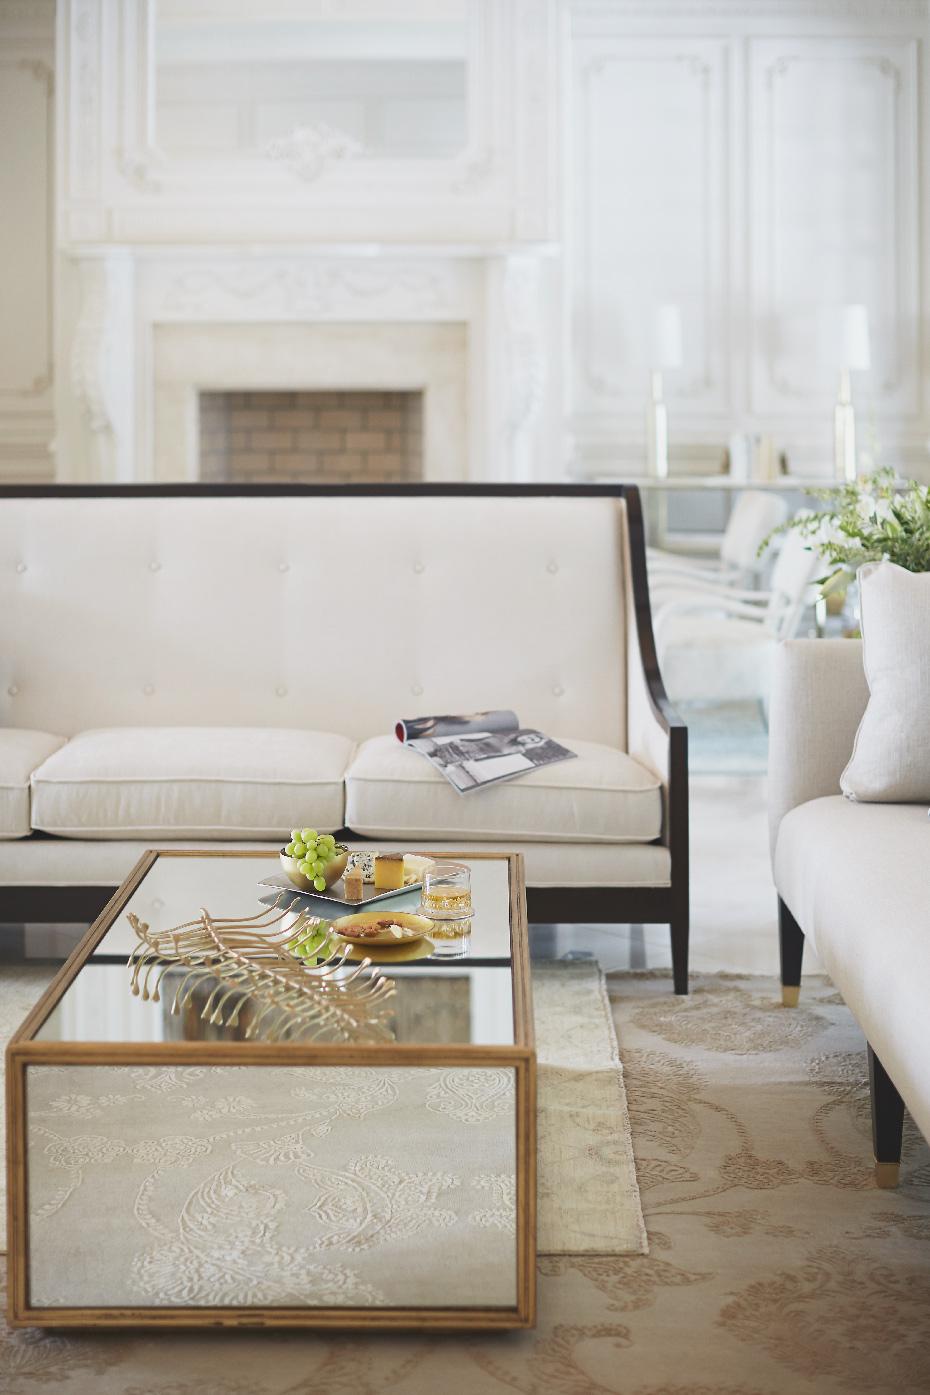 Stacey Van Berkel Photography I Elegant white on white interior I Parisian Apartment I Bernhardt Furniture